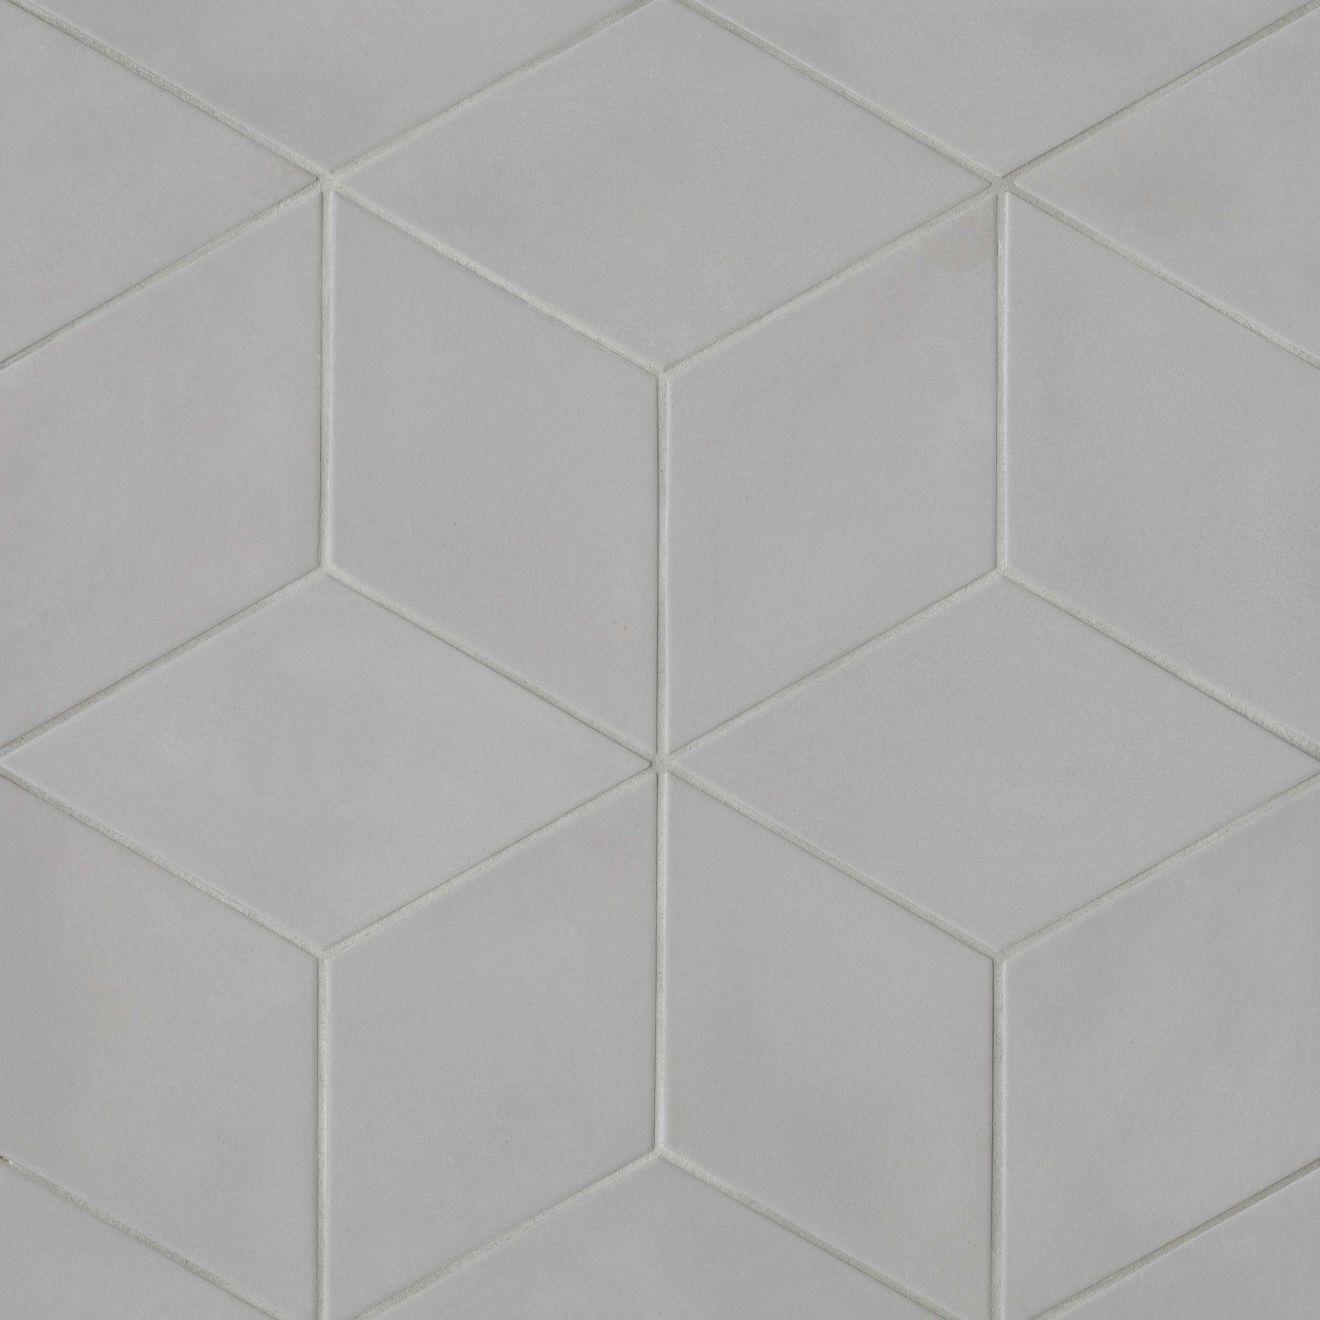 "Allora 7.5"" x 12.75"" Floor & Wall Tile in Solid Grey"